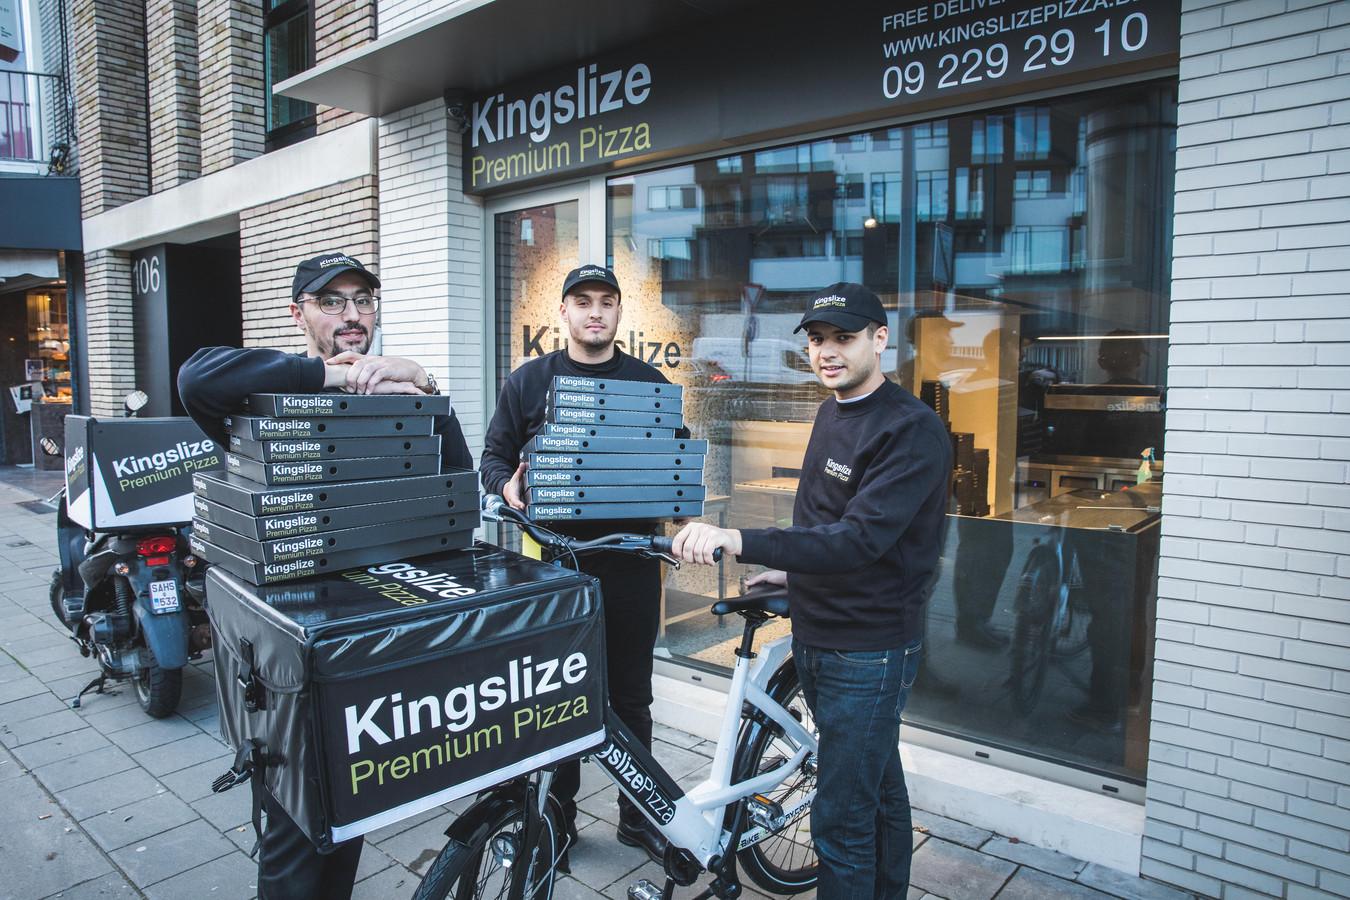 kingslize pizza